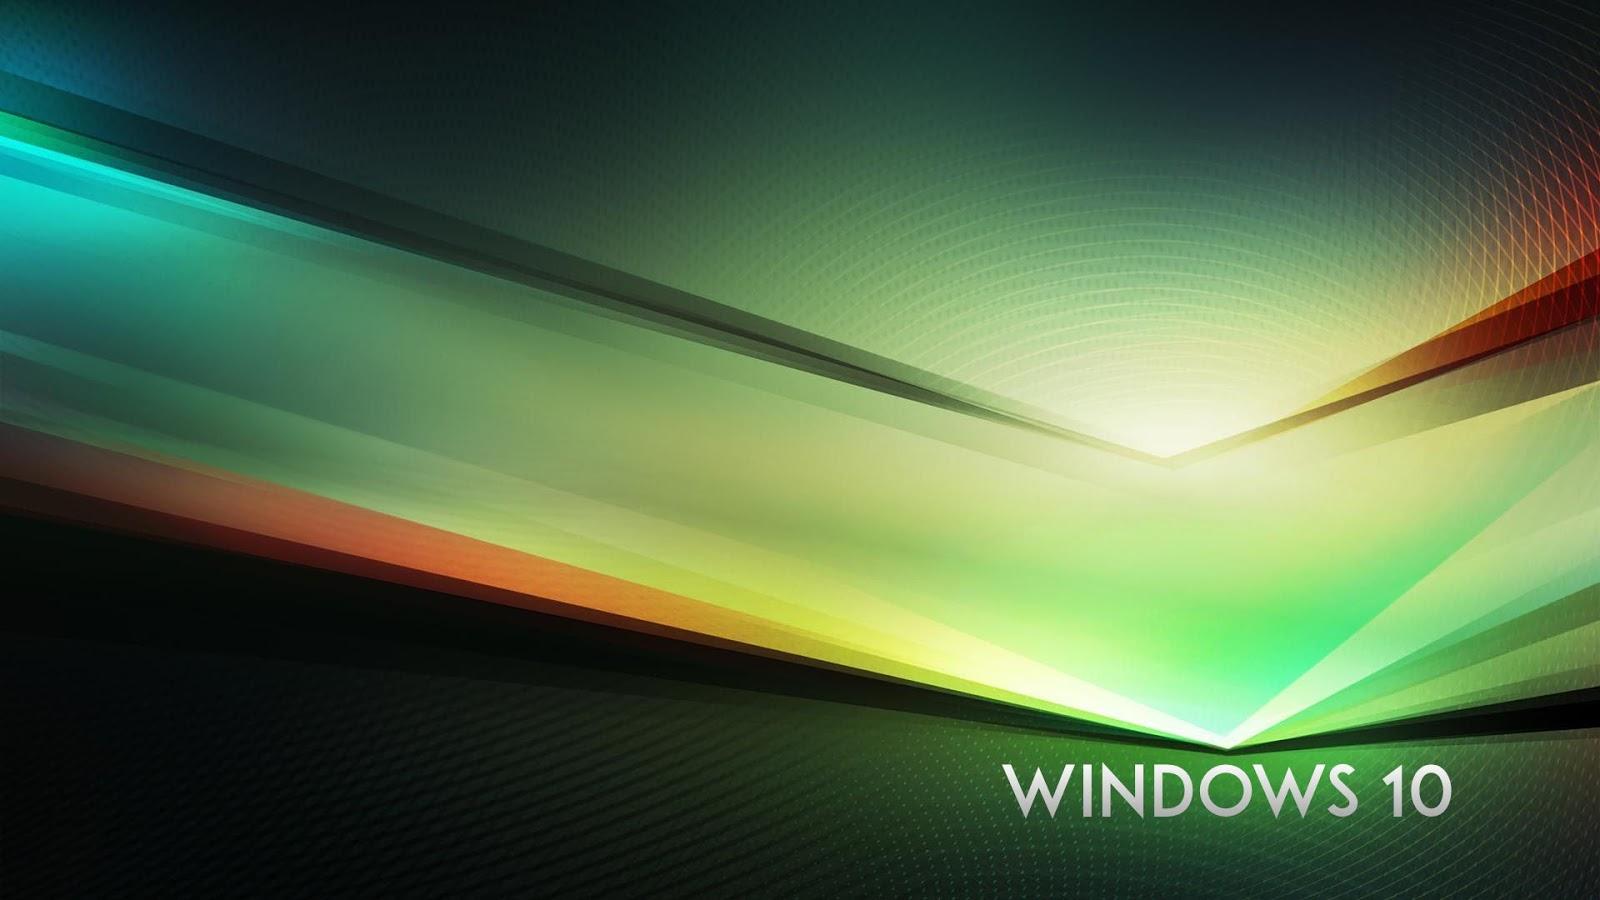 Windows 10 Wallpaper Pack: Windows 10 Wallpapers Pack 2016 - No: 1